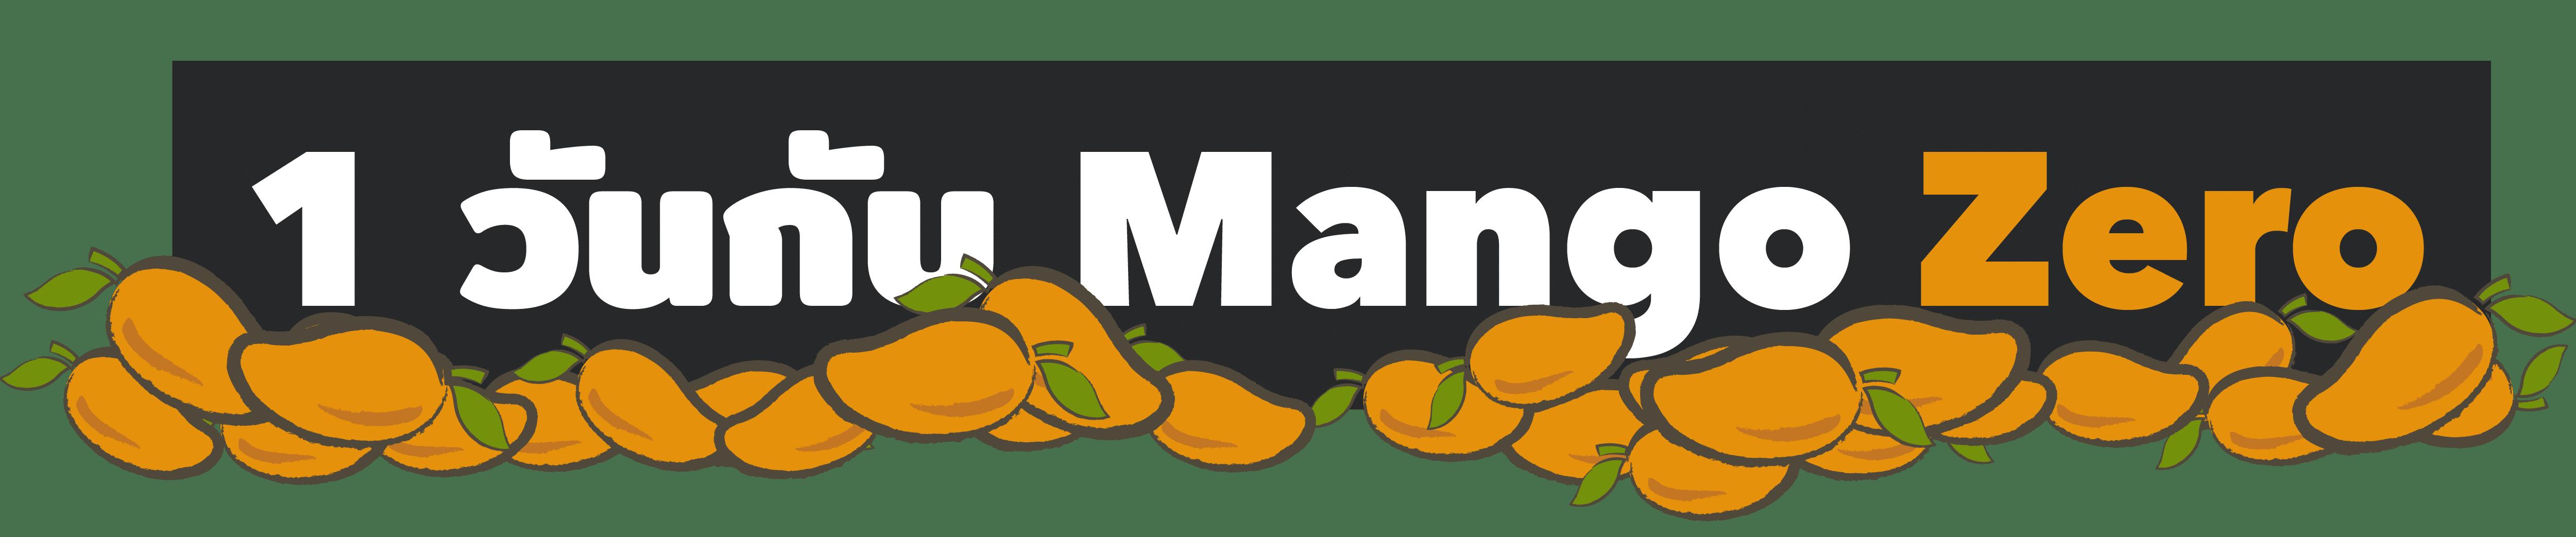 1-year-mango-title1